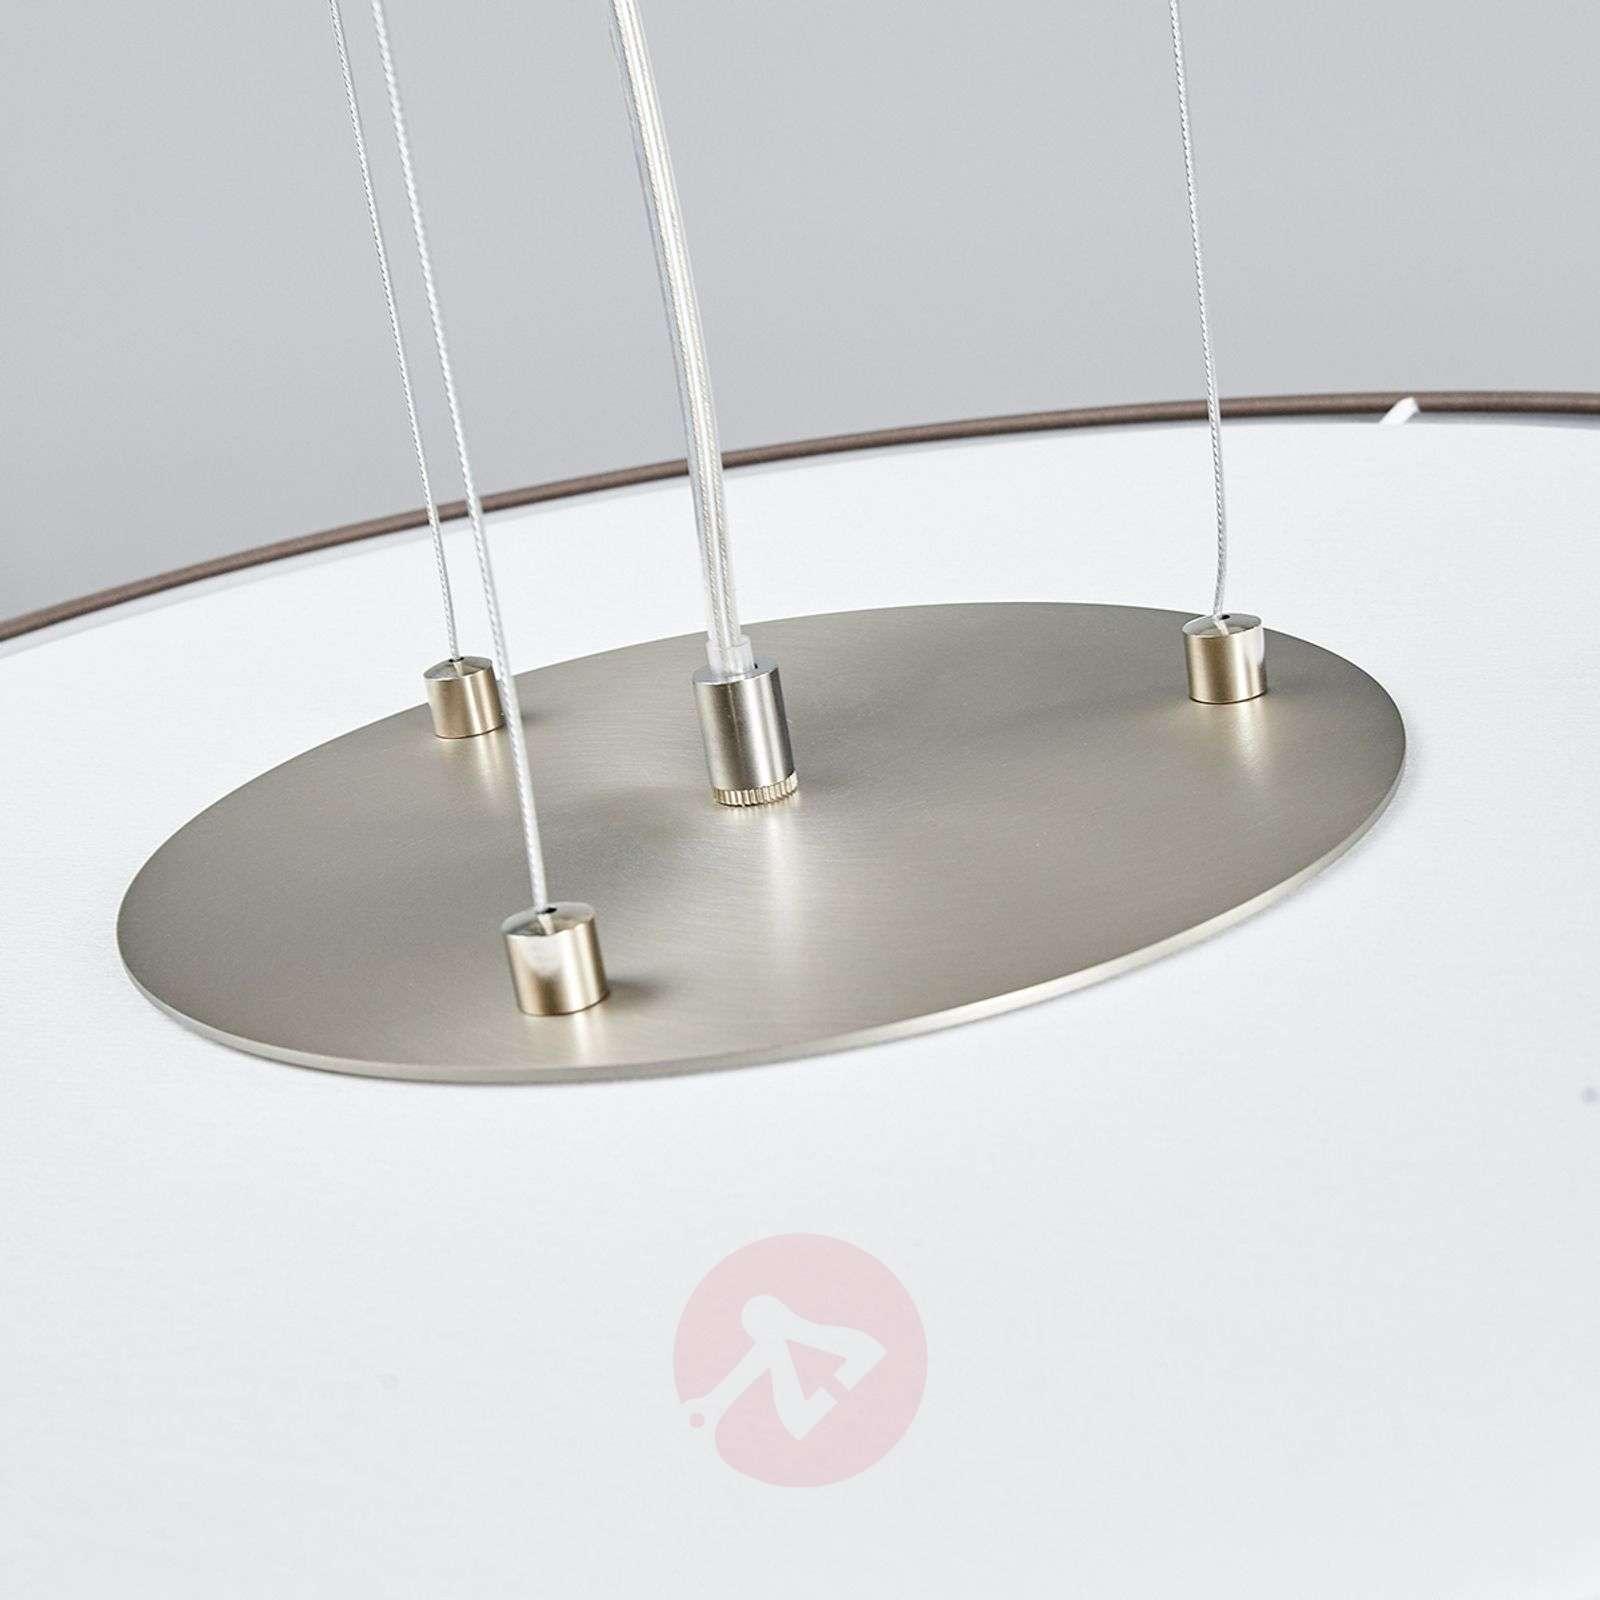 LED-riippuvalo Gala, 50 cm, taupe sintsi-6722453-01